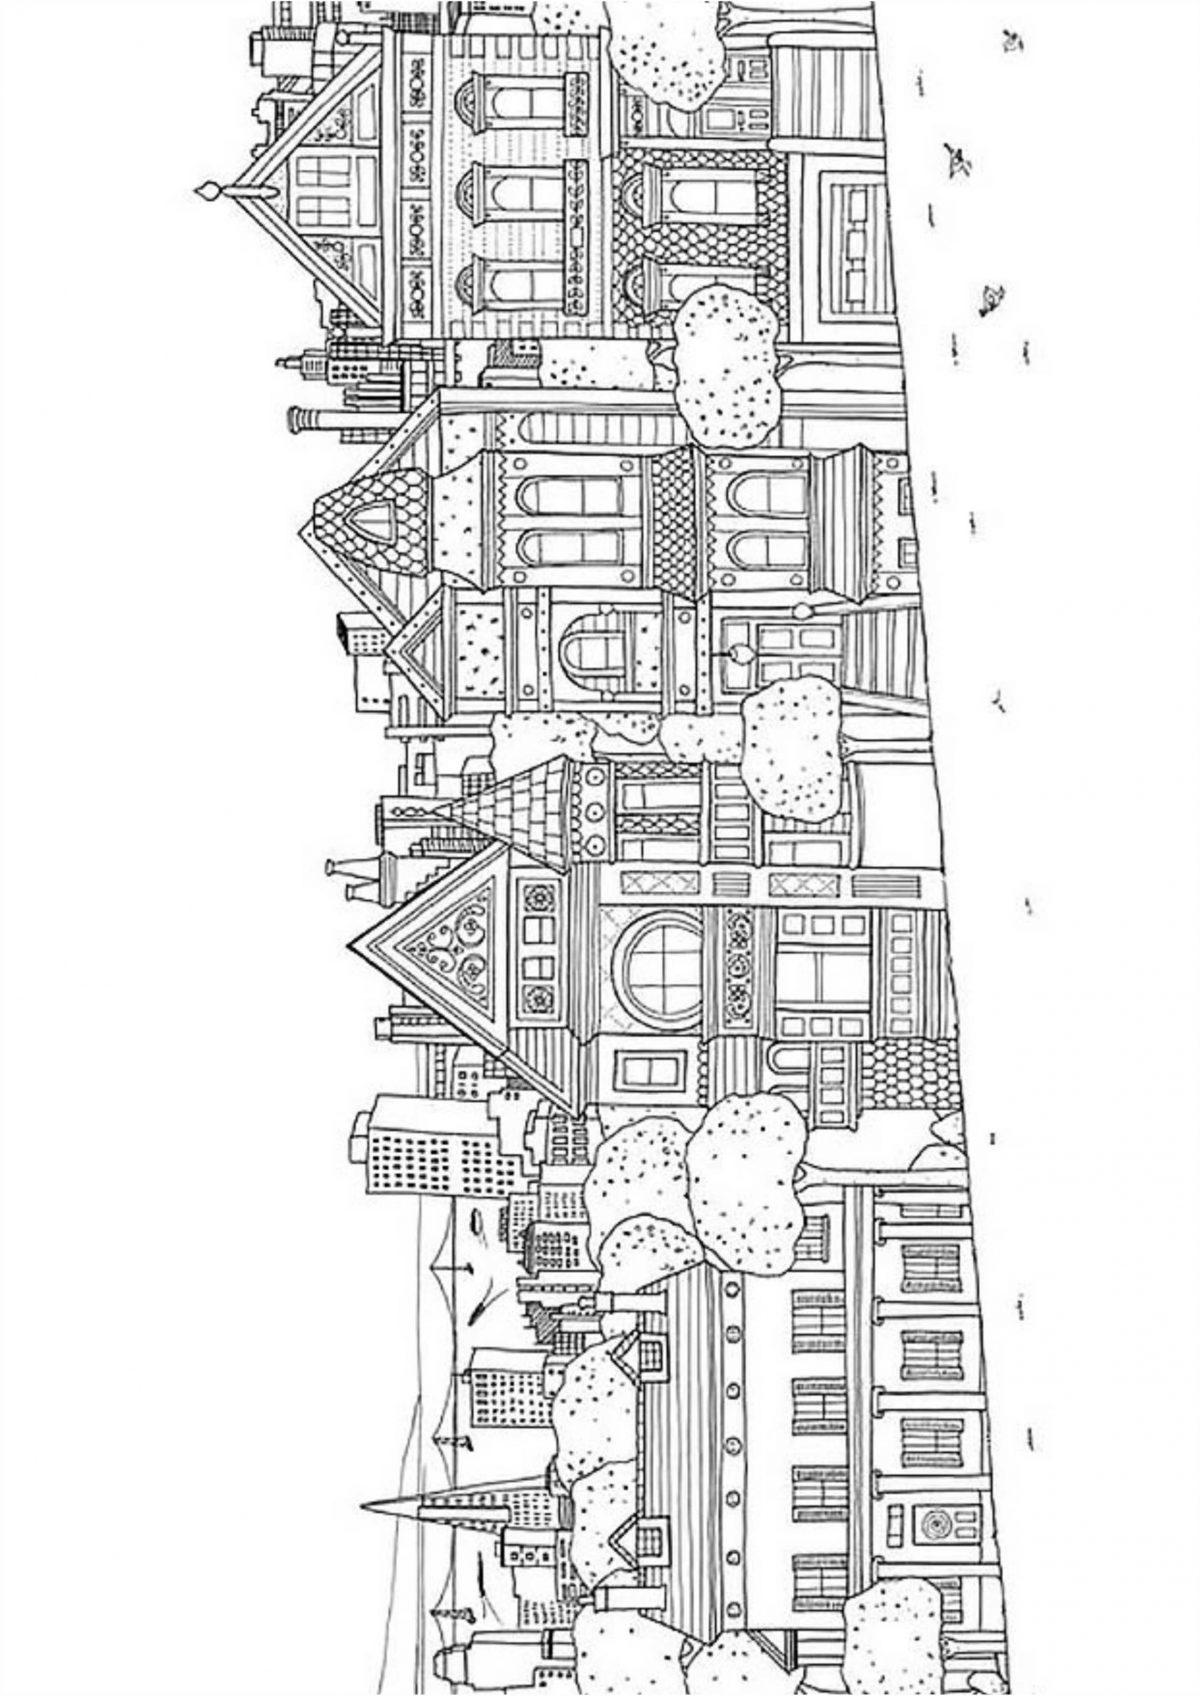 Раскраска город - Раскраски А4 формата для распечатки